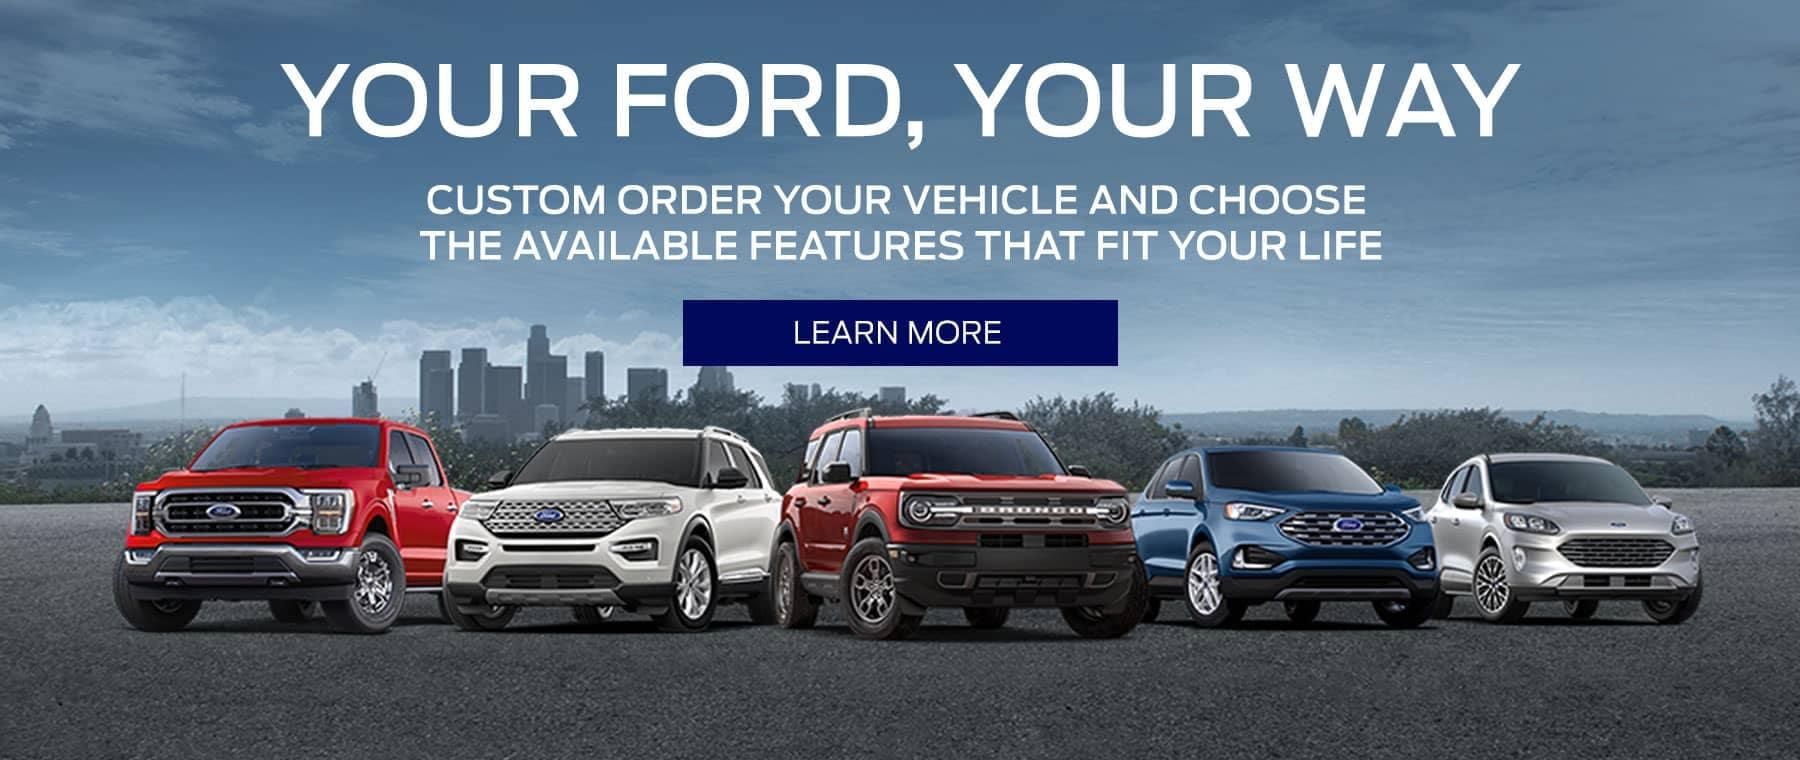 custom ford